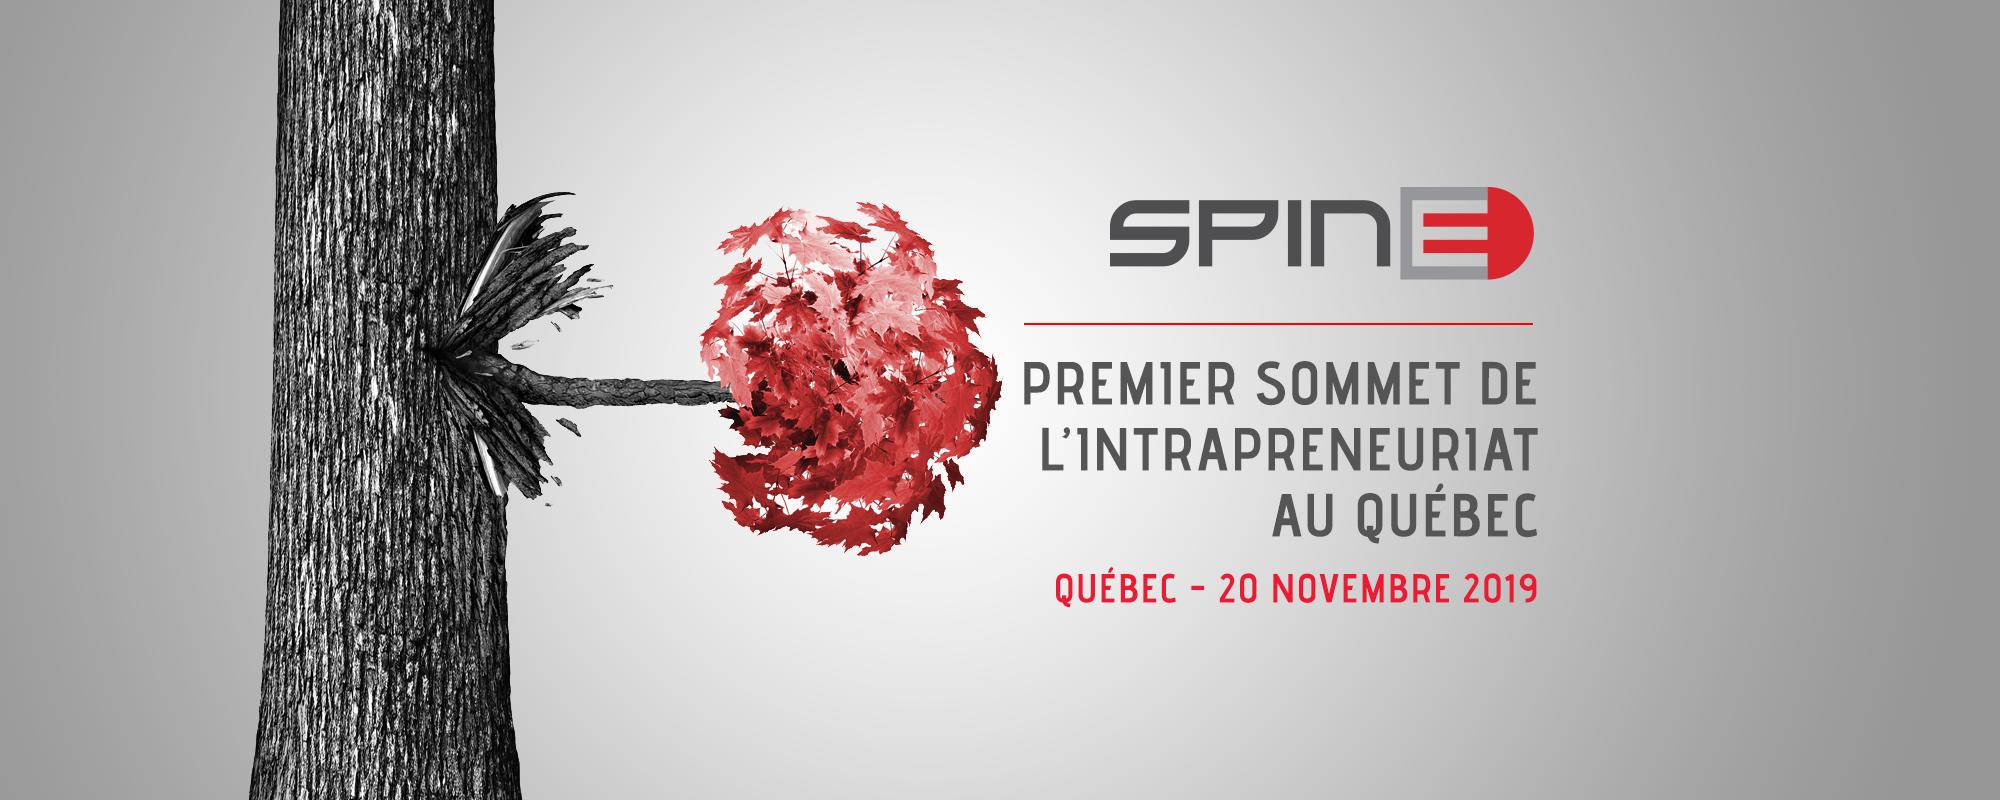 SPINE | Premier Sommet de L'Intrapreneuriat au Quebec